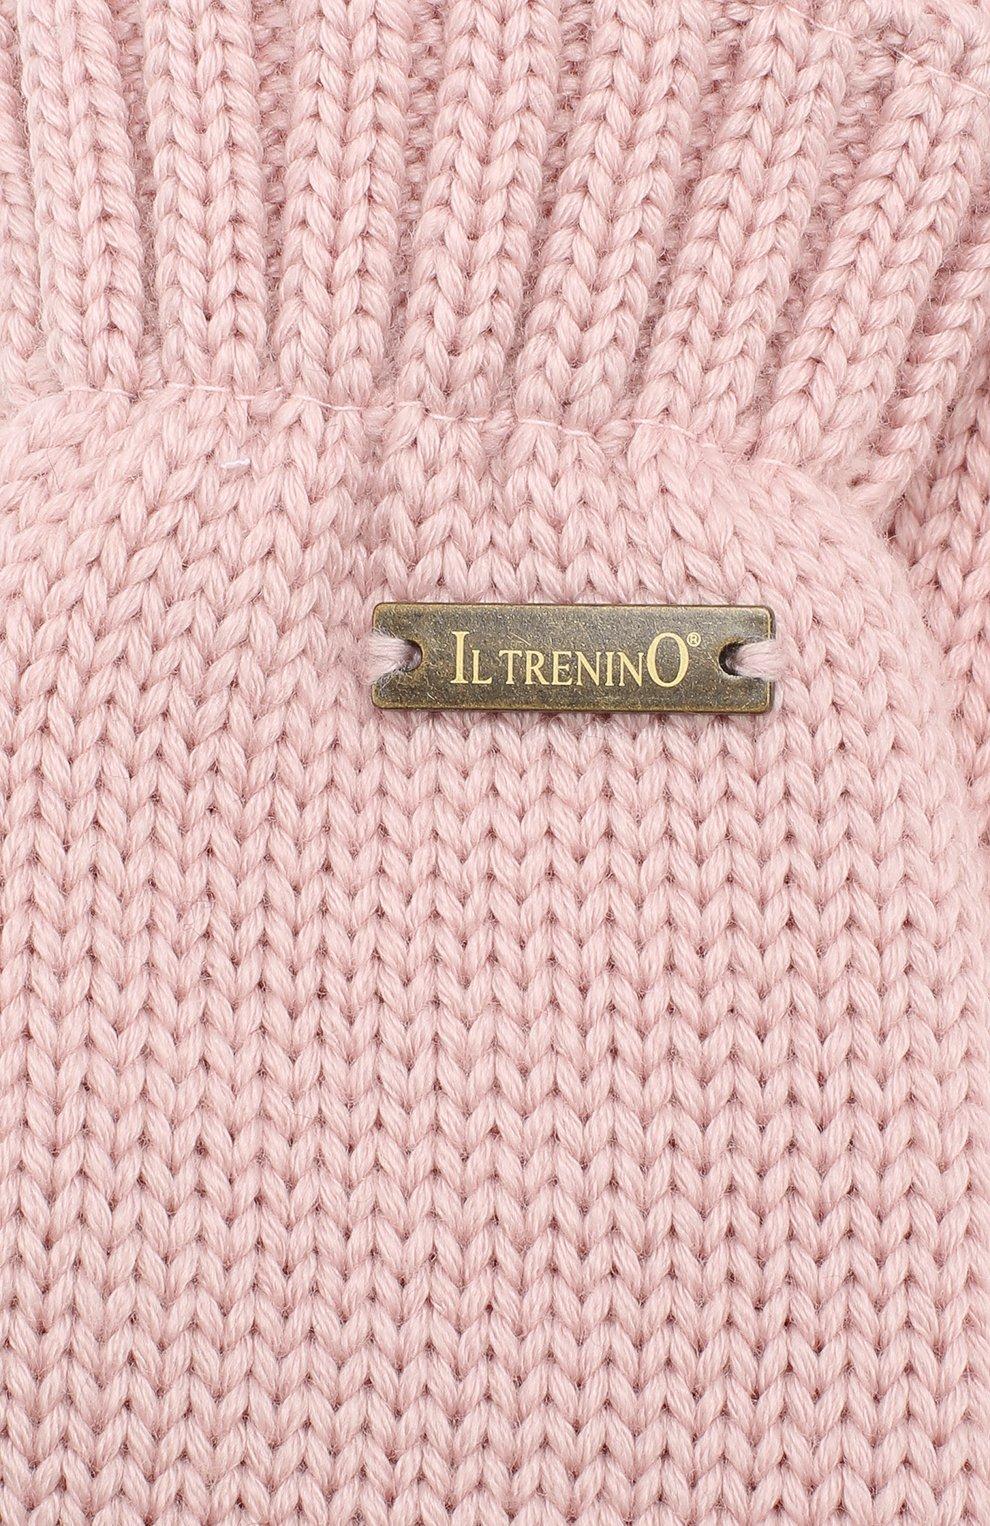 Детские шерстяные варежки IL TRENINO розового цвета, арт. 19 9664/E2 | Фото 3